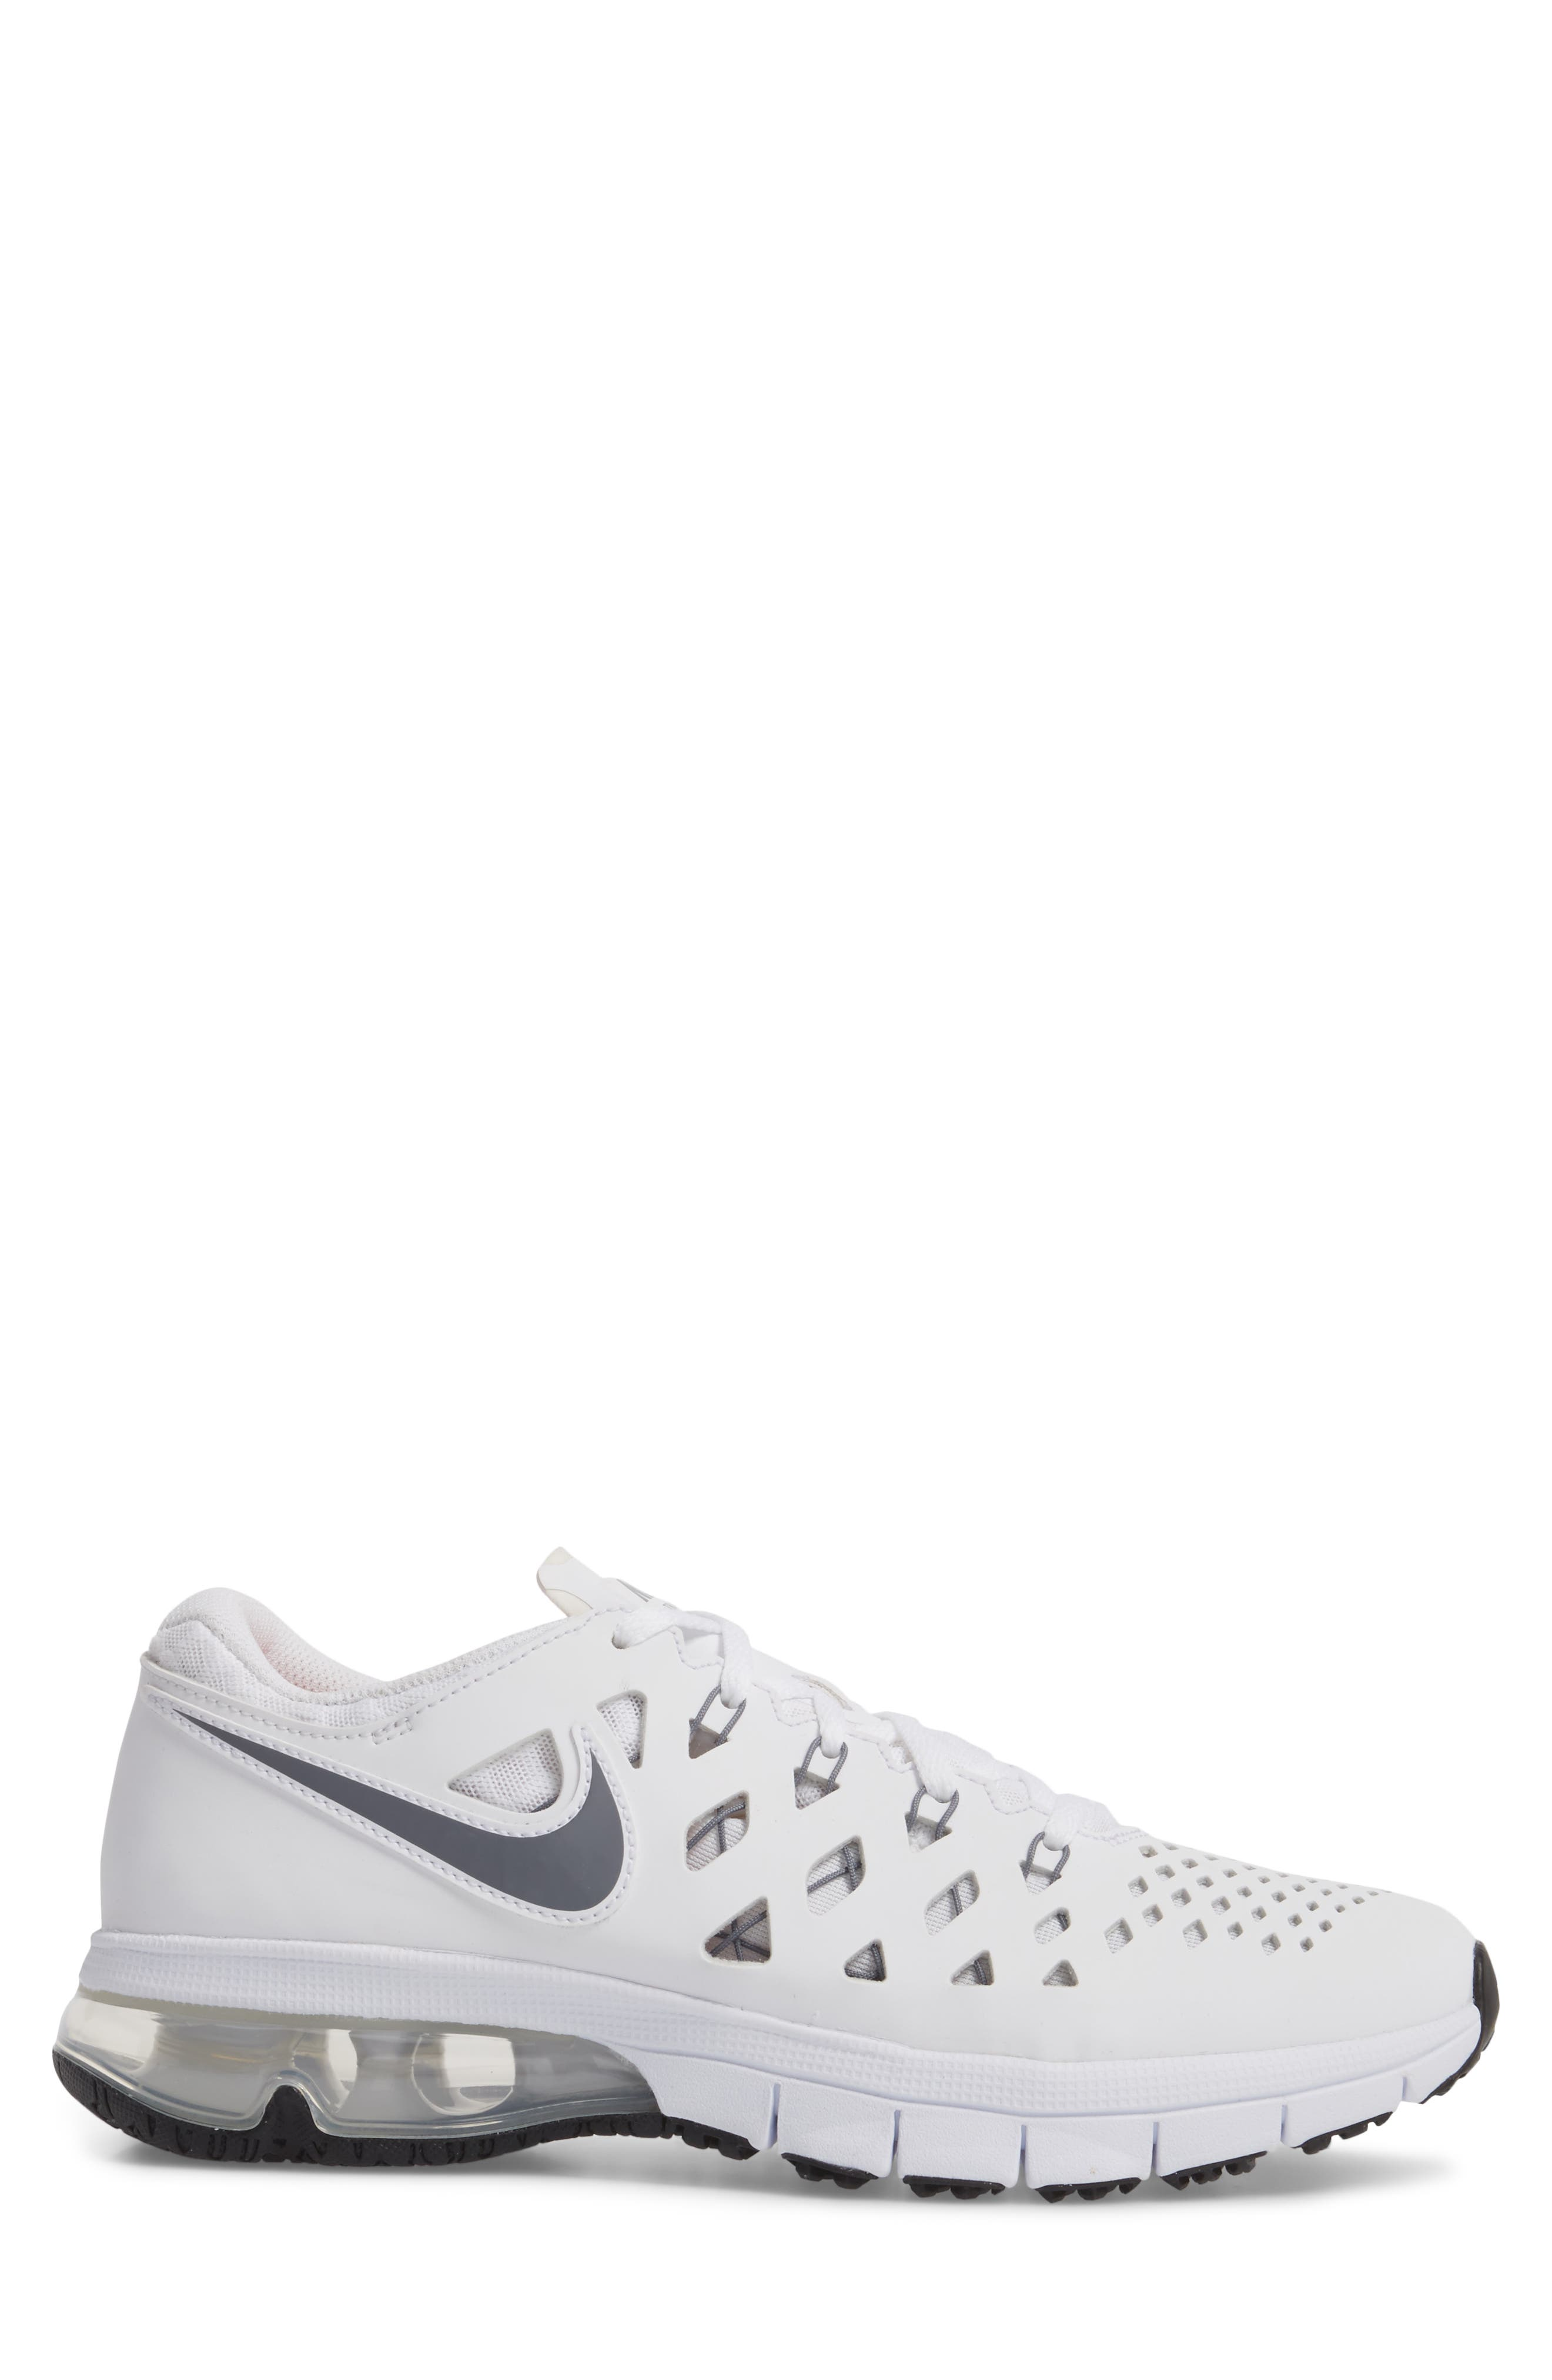 Air Trainer 180 Training Shoe,                             Alternate thumbnail 3, color,                             White/ Cool Grey-Black